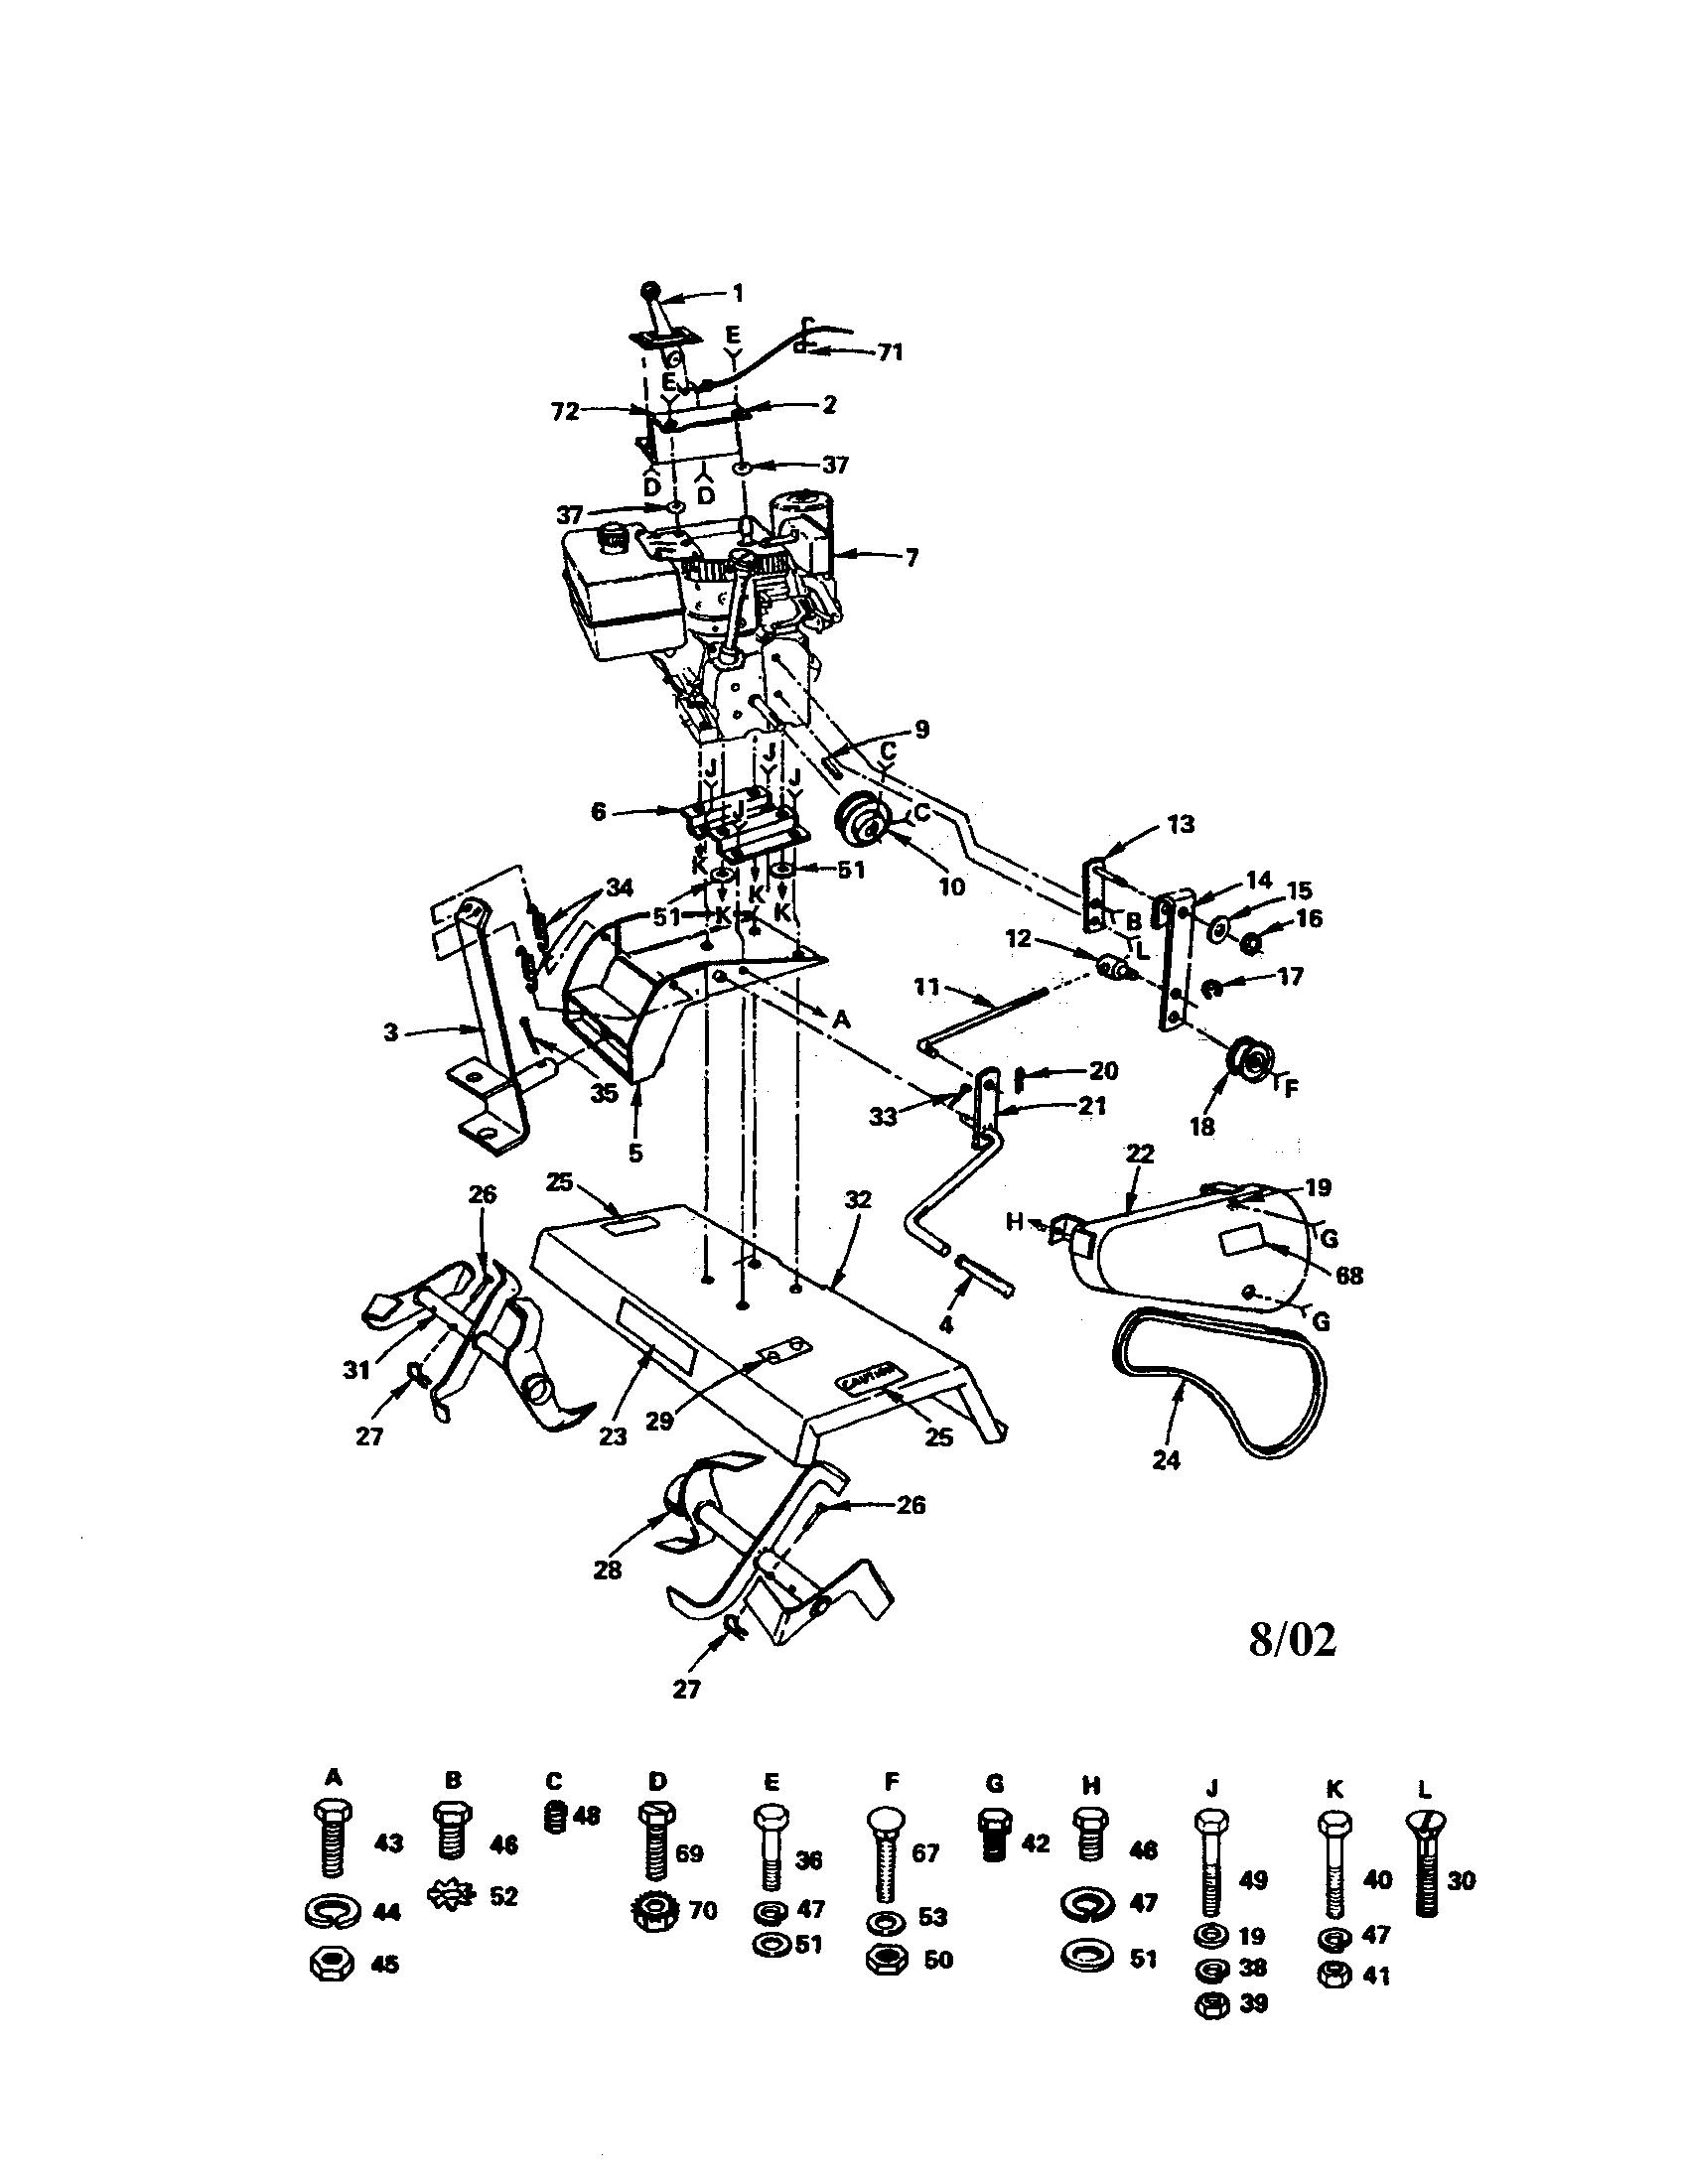 Farmall Super C Wiring Diagram - Wiring Diagrams Schematics